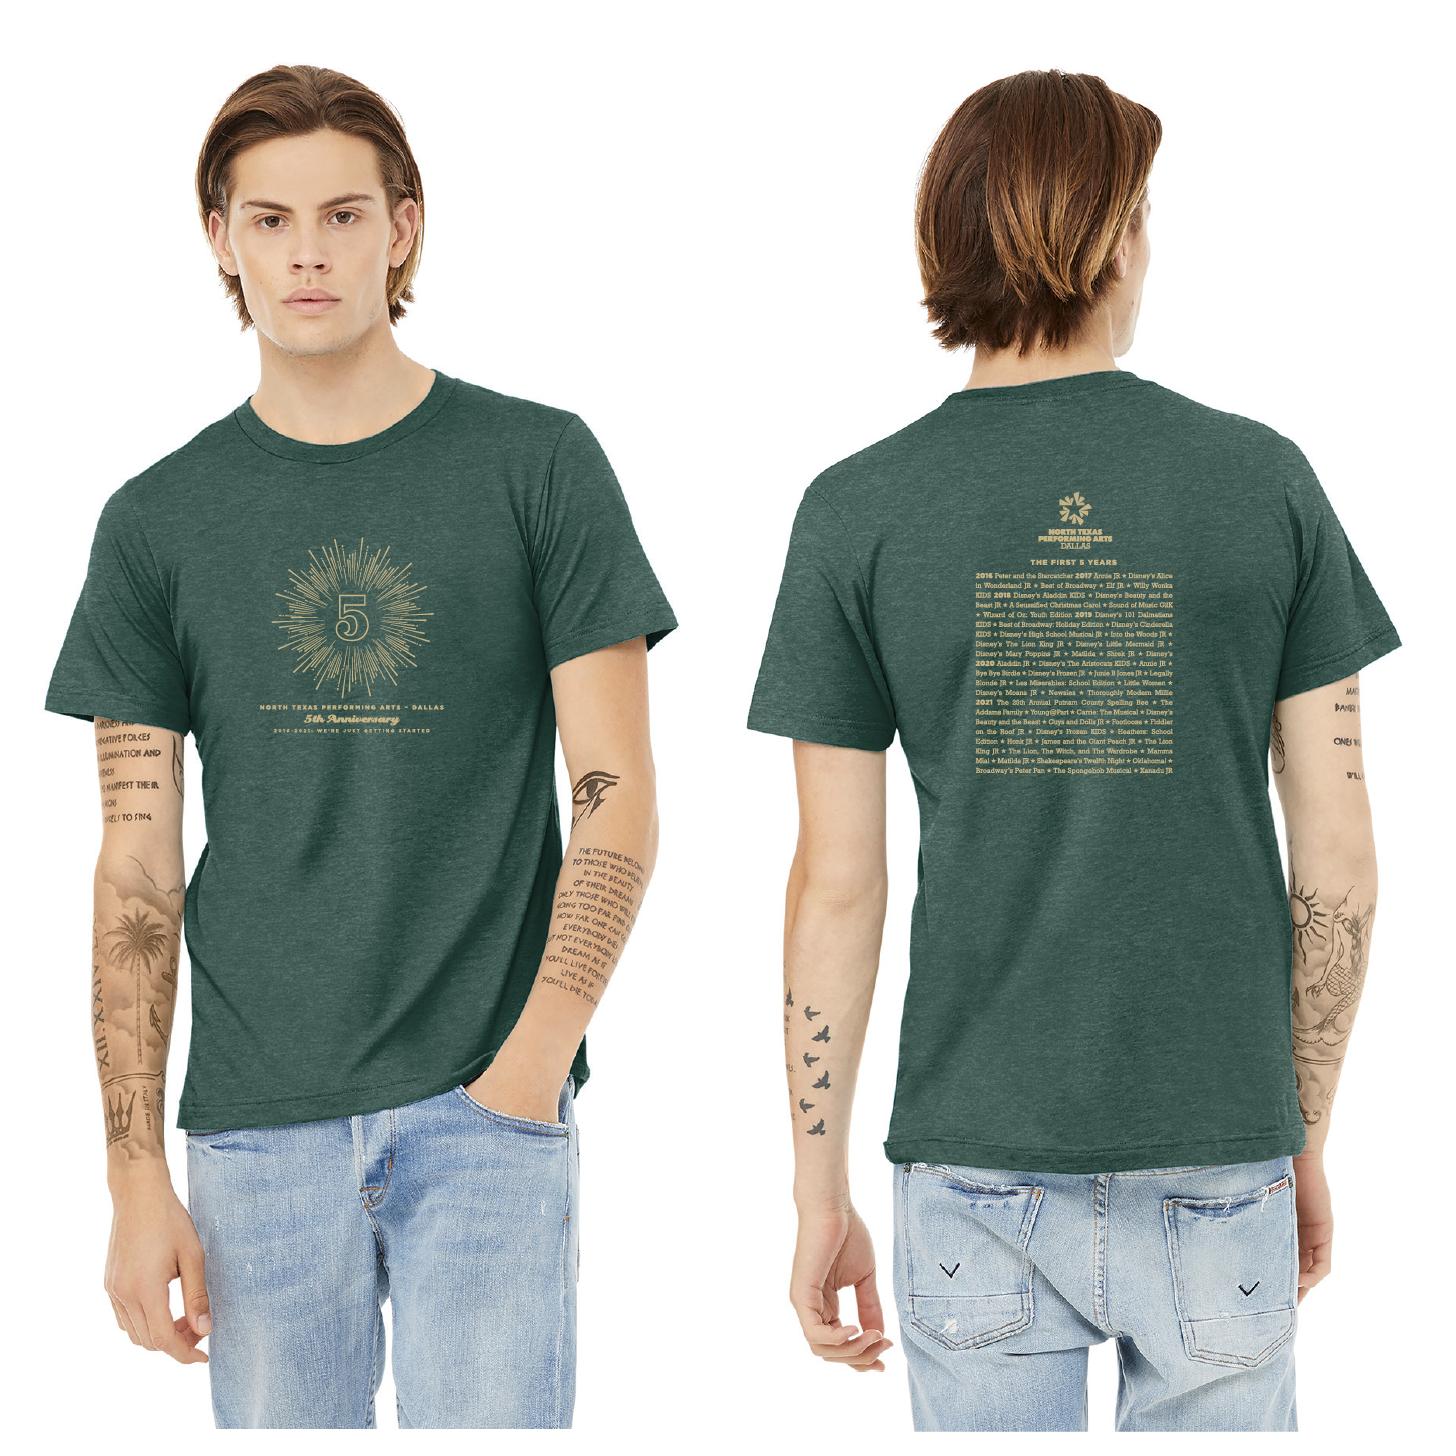 Dallas 5th Anniversary T-Shirt adult mock up